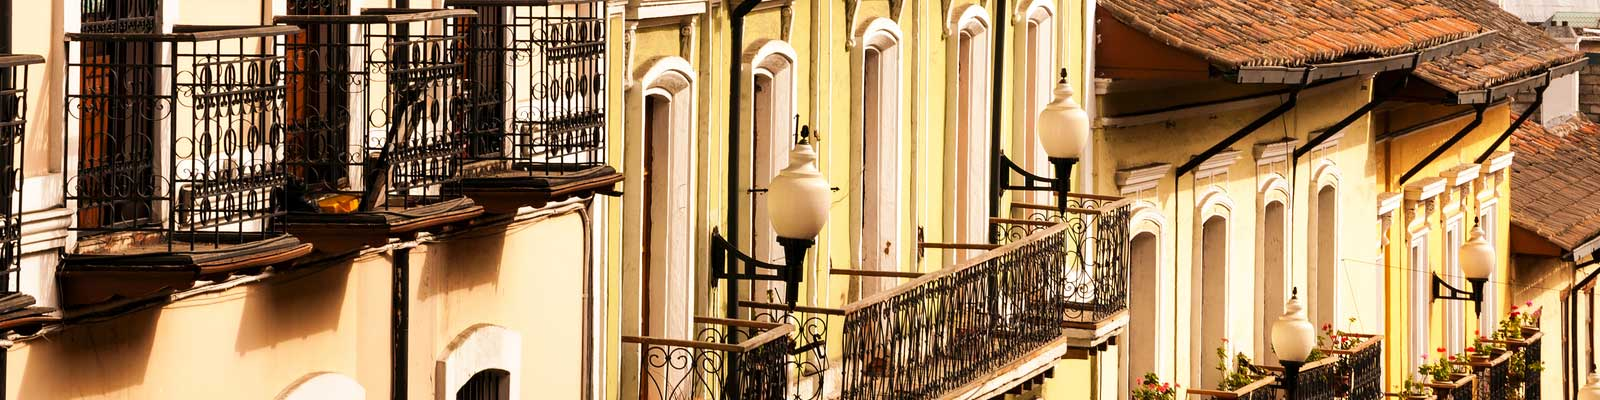 Ecuador Casas com Varanda Residencial, Comercial, Terrenos. A venda, ou para Alugar.